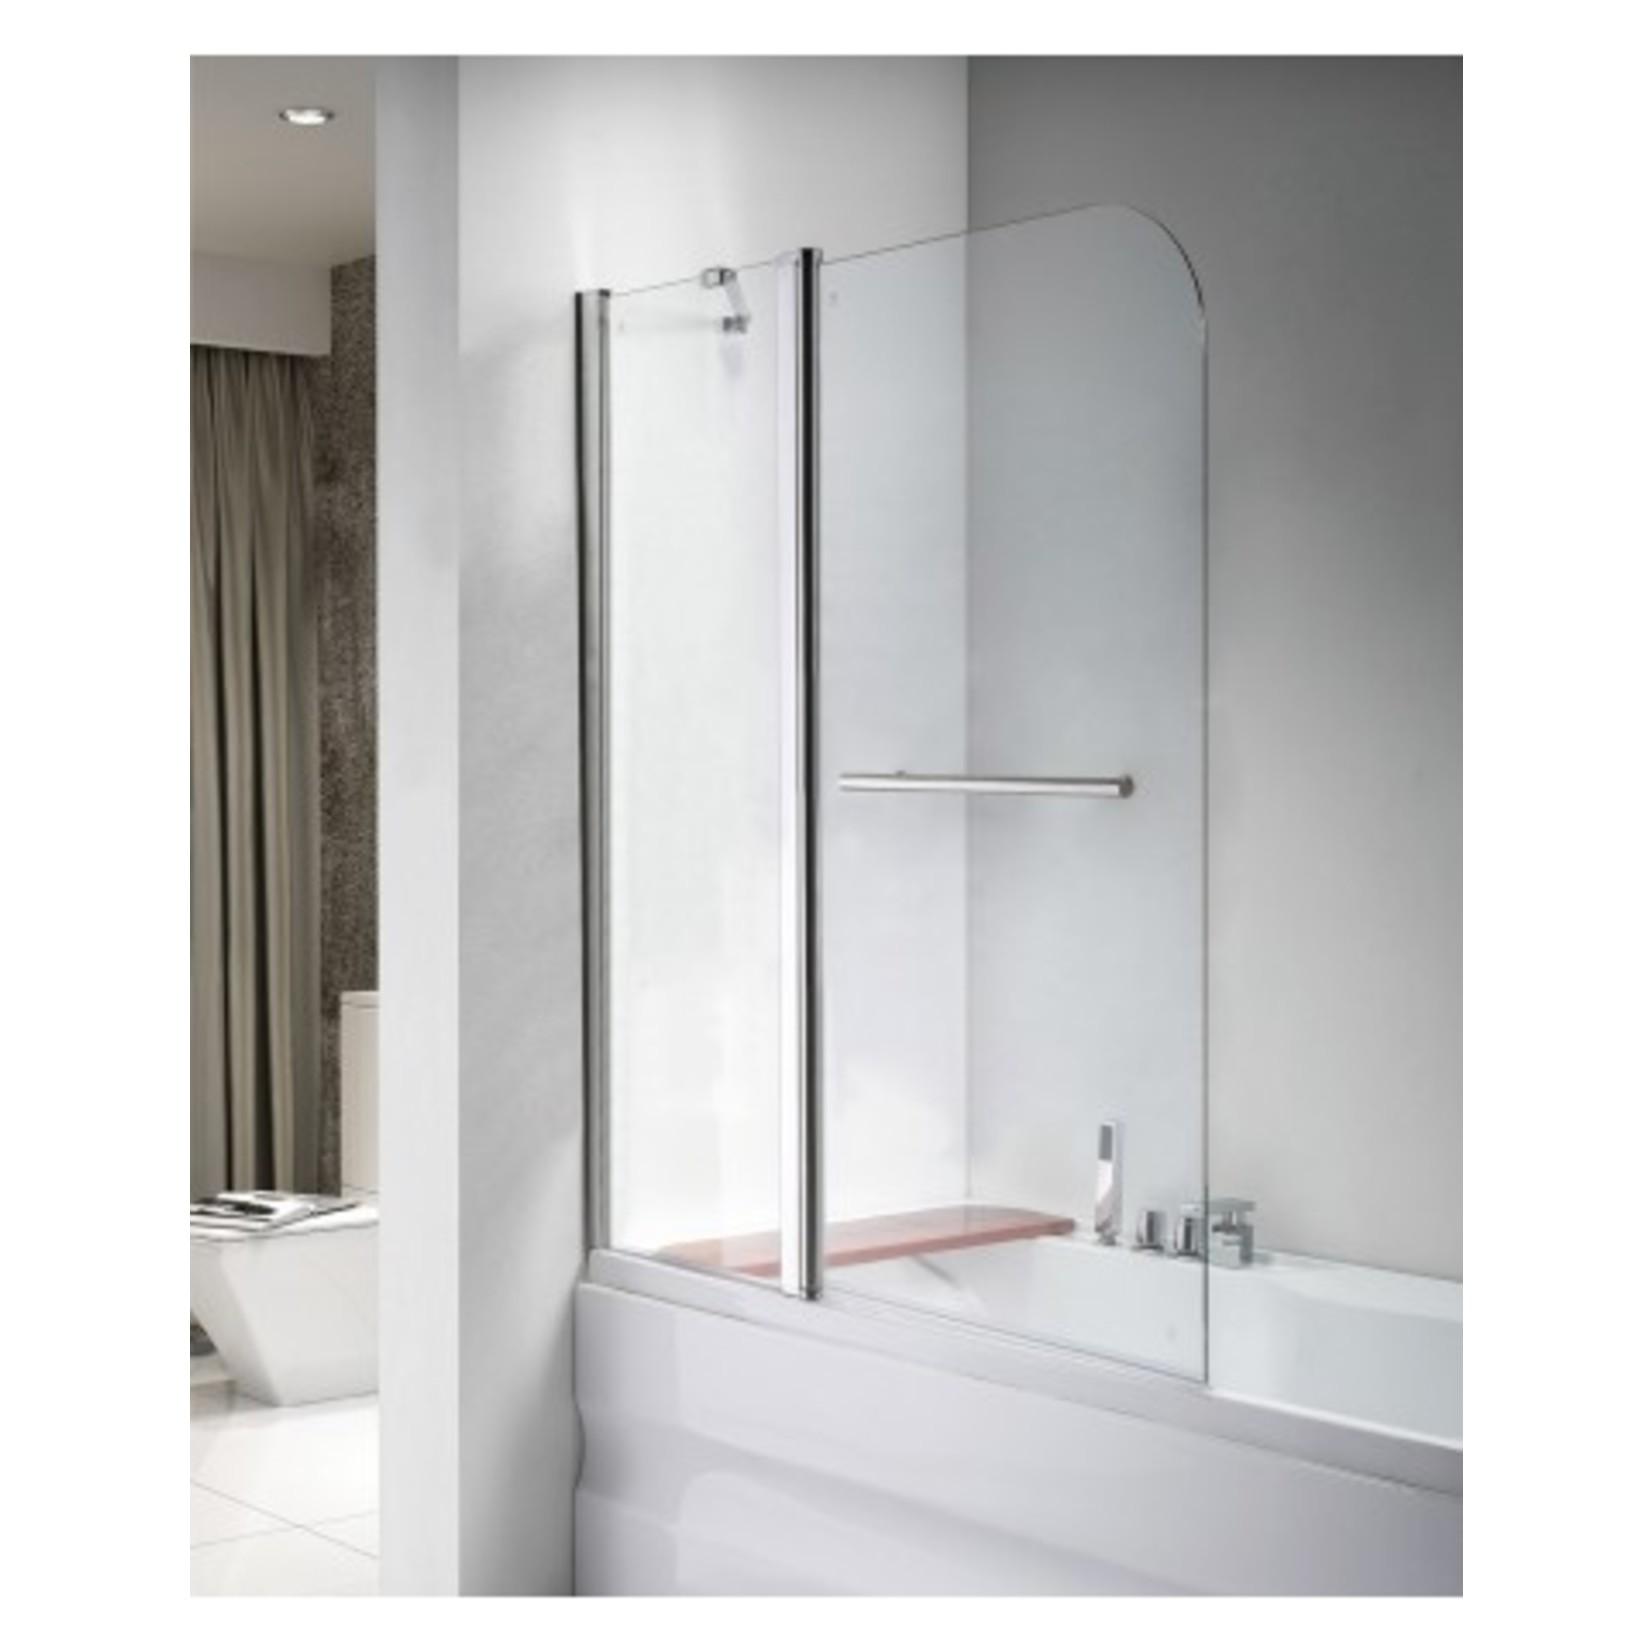 Bey chrome bath screen 8STSD-CHR